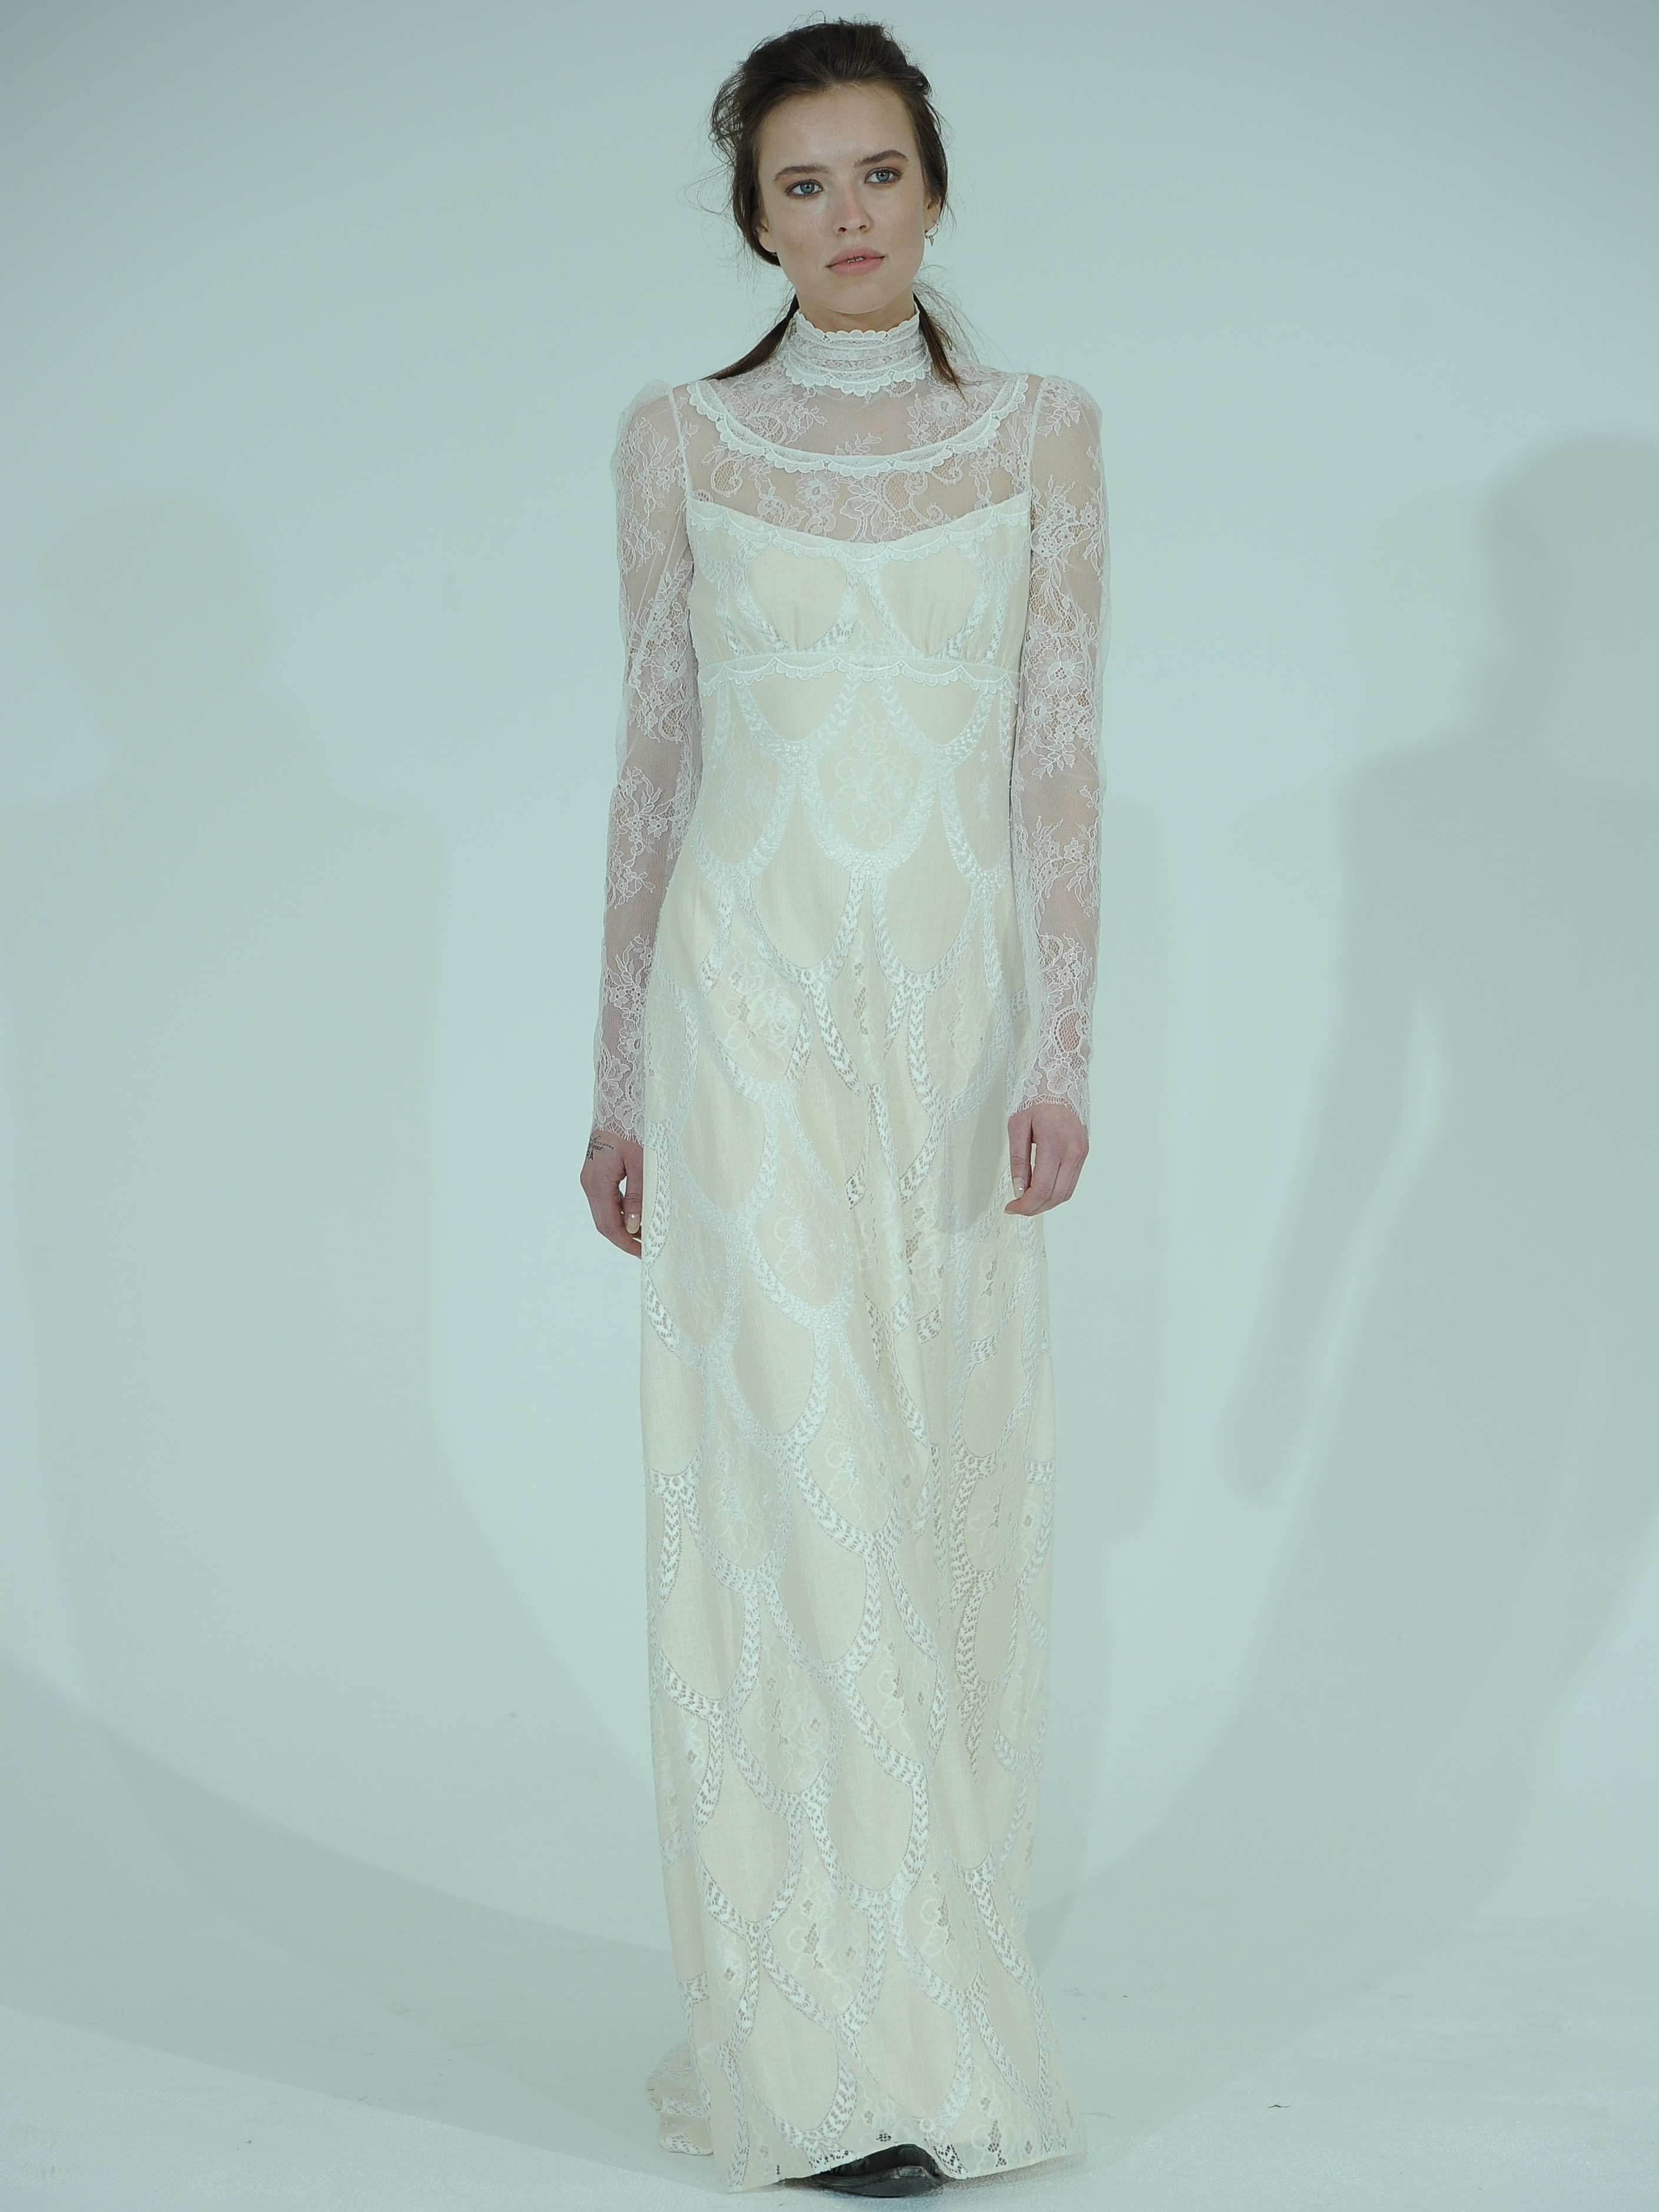 Spring Wedding Dresses.Claire Pettibone S Spring Wedding Dresses Take Us Back To